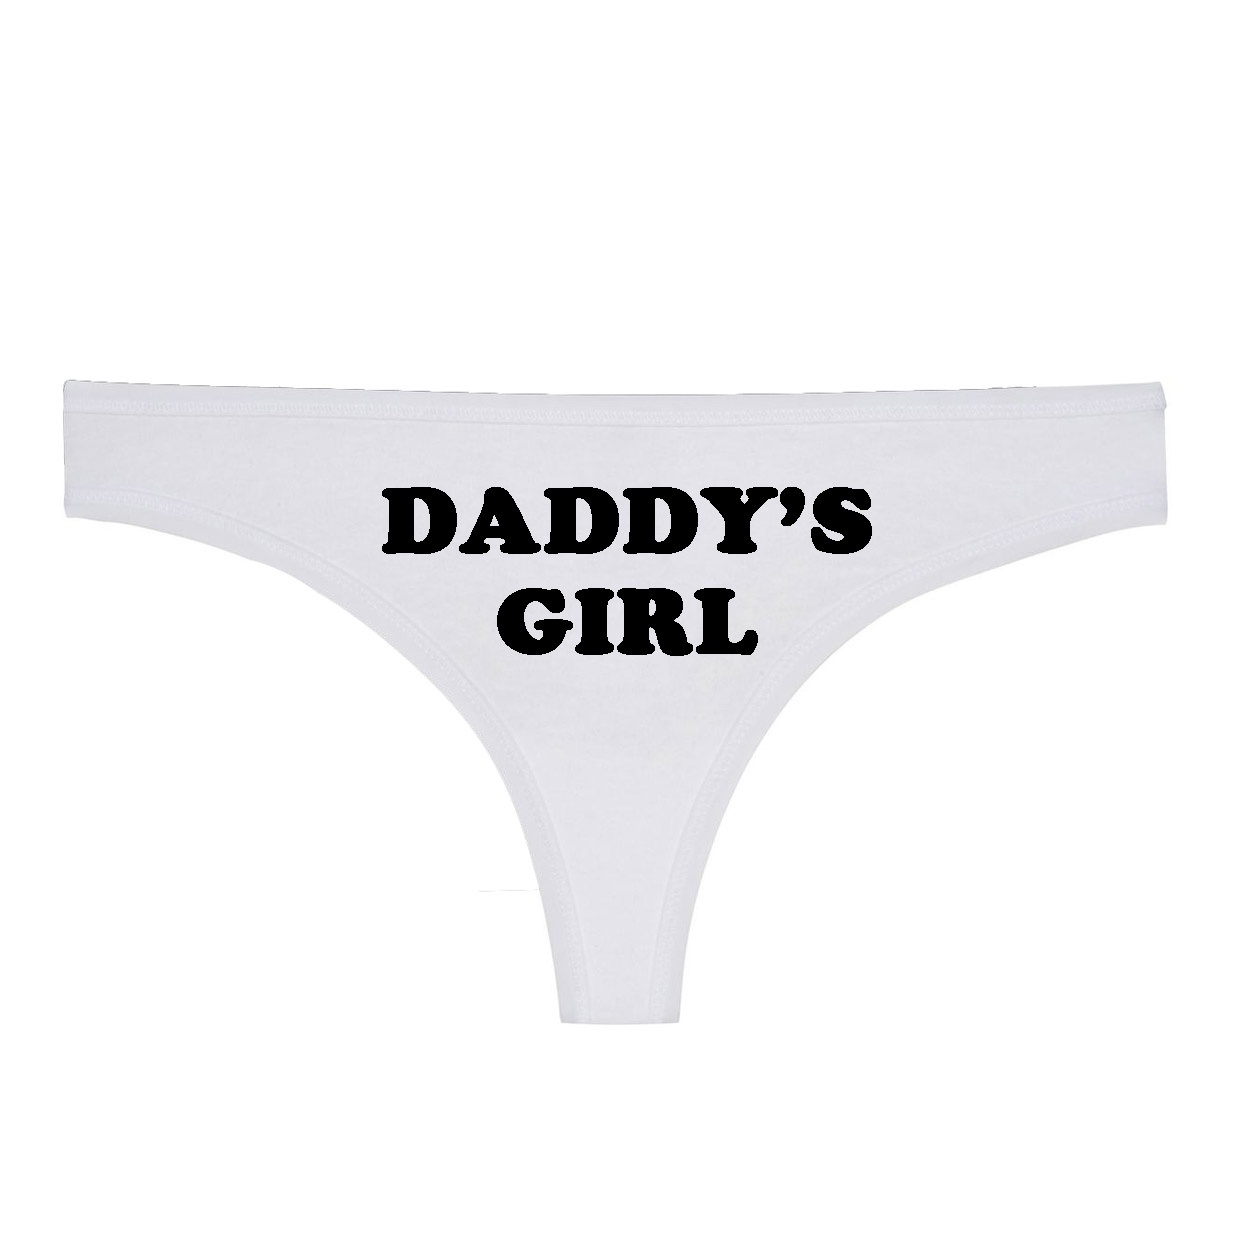 48b2b61c5ab5 Women Sexy Seamless Thong Underwear DADDYS GIRL Print Funny Women T Panties G  String Sexy Low Waist